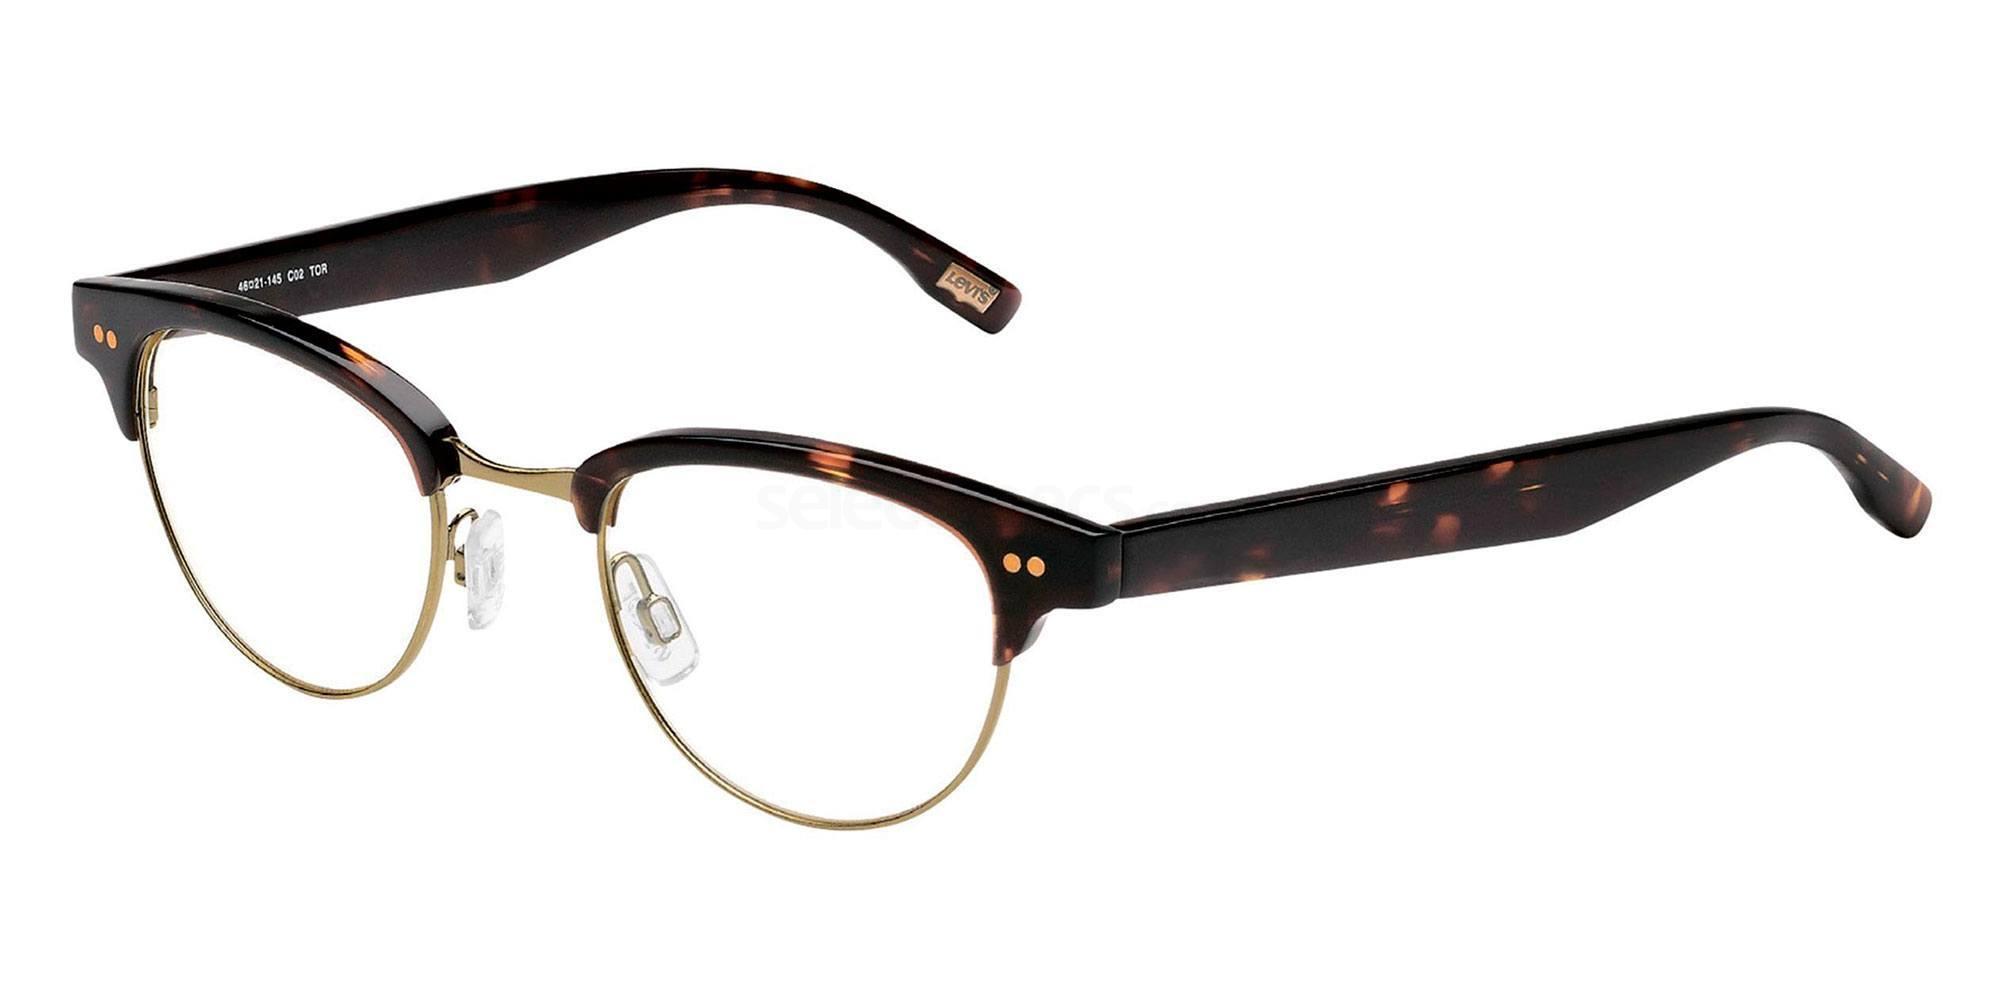 02 TOR LS111 Glasses, Levi's Eyewear